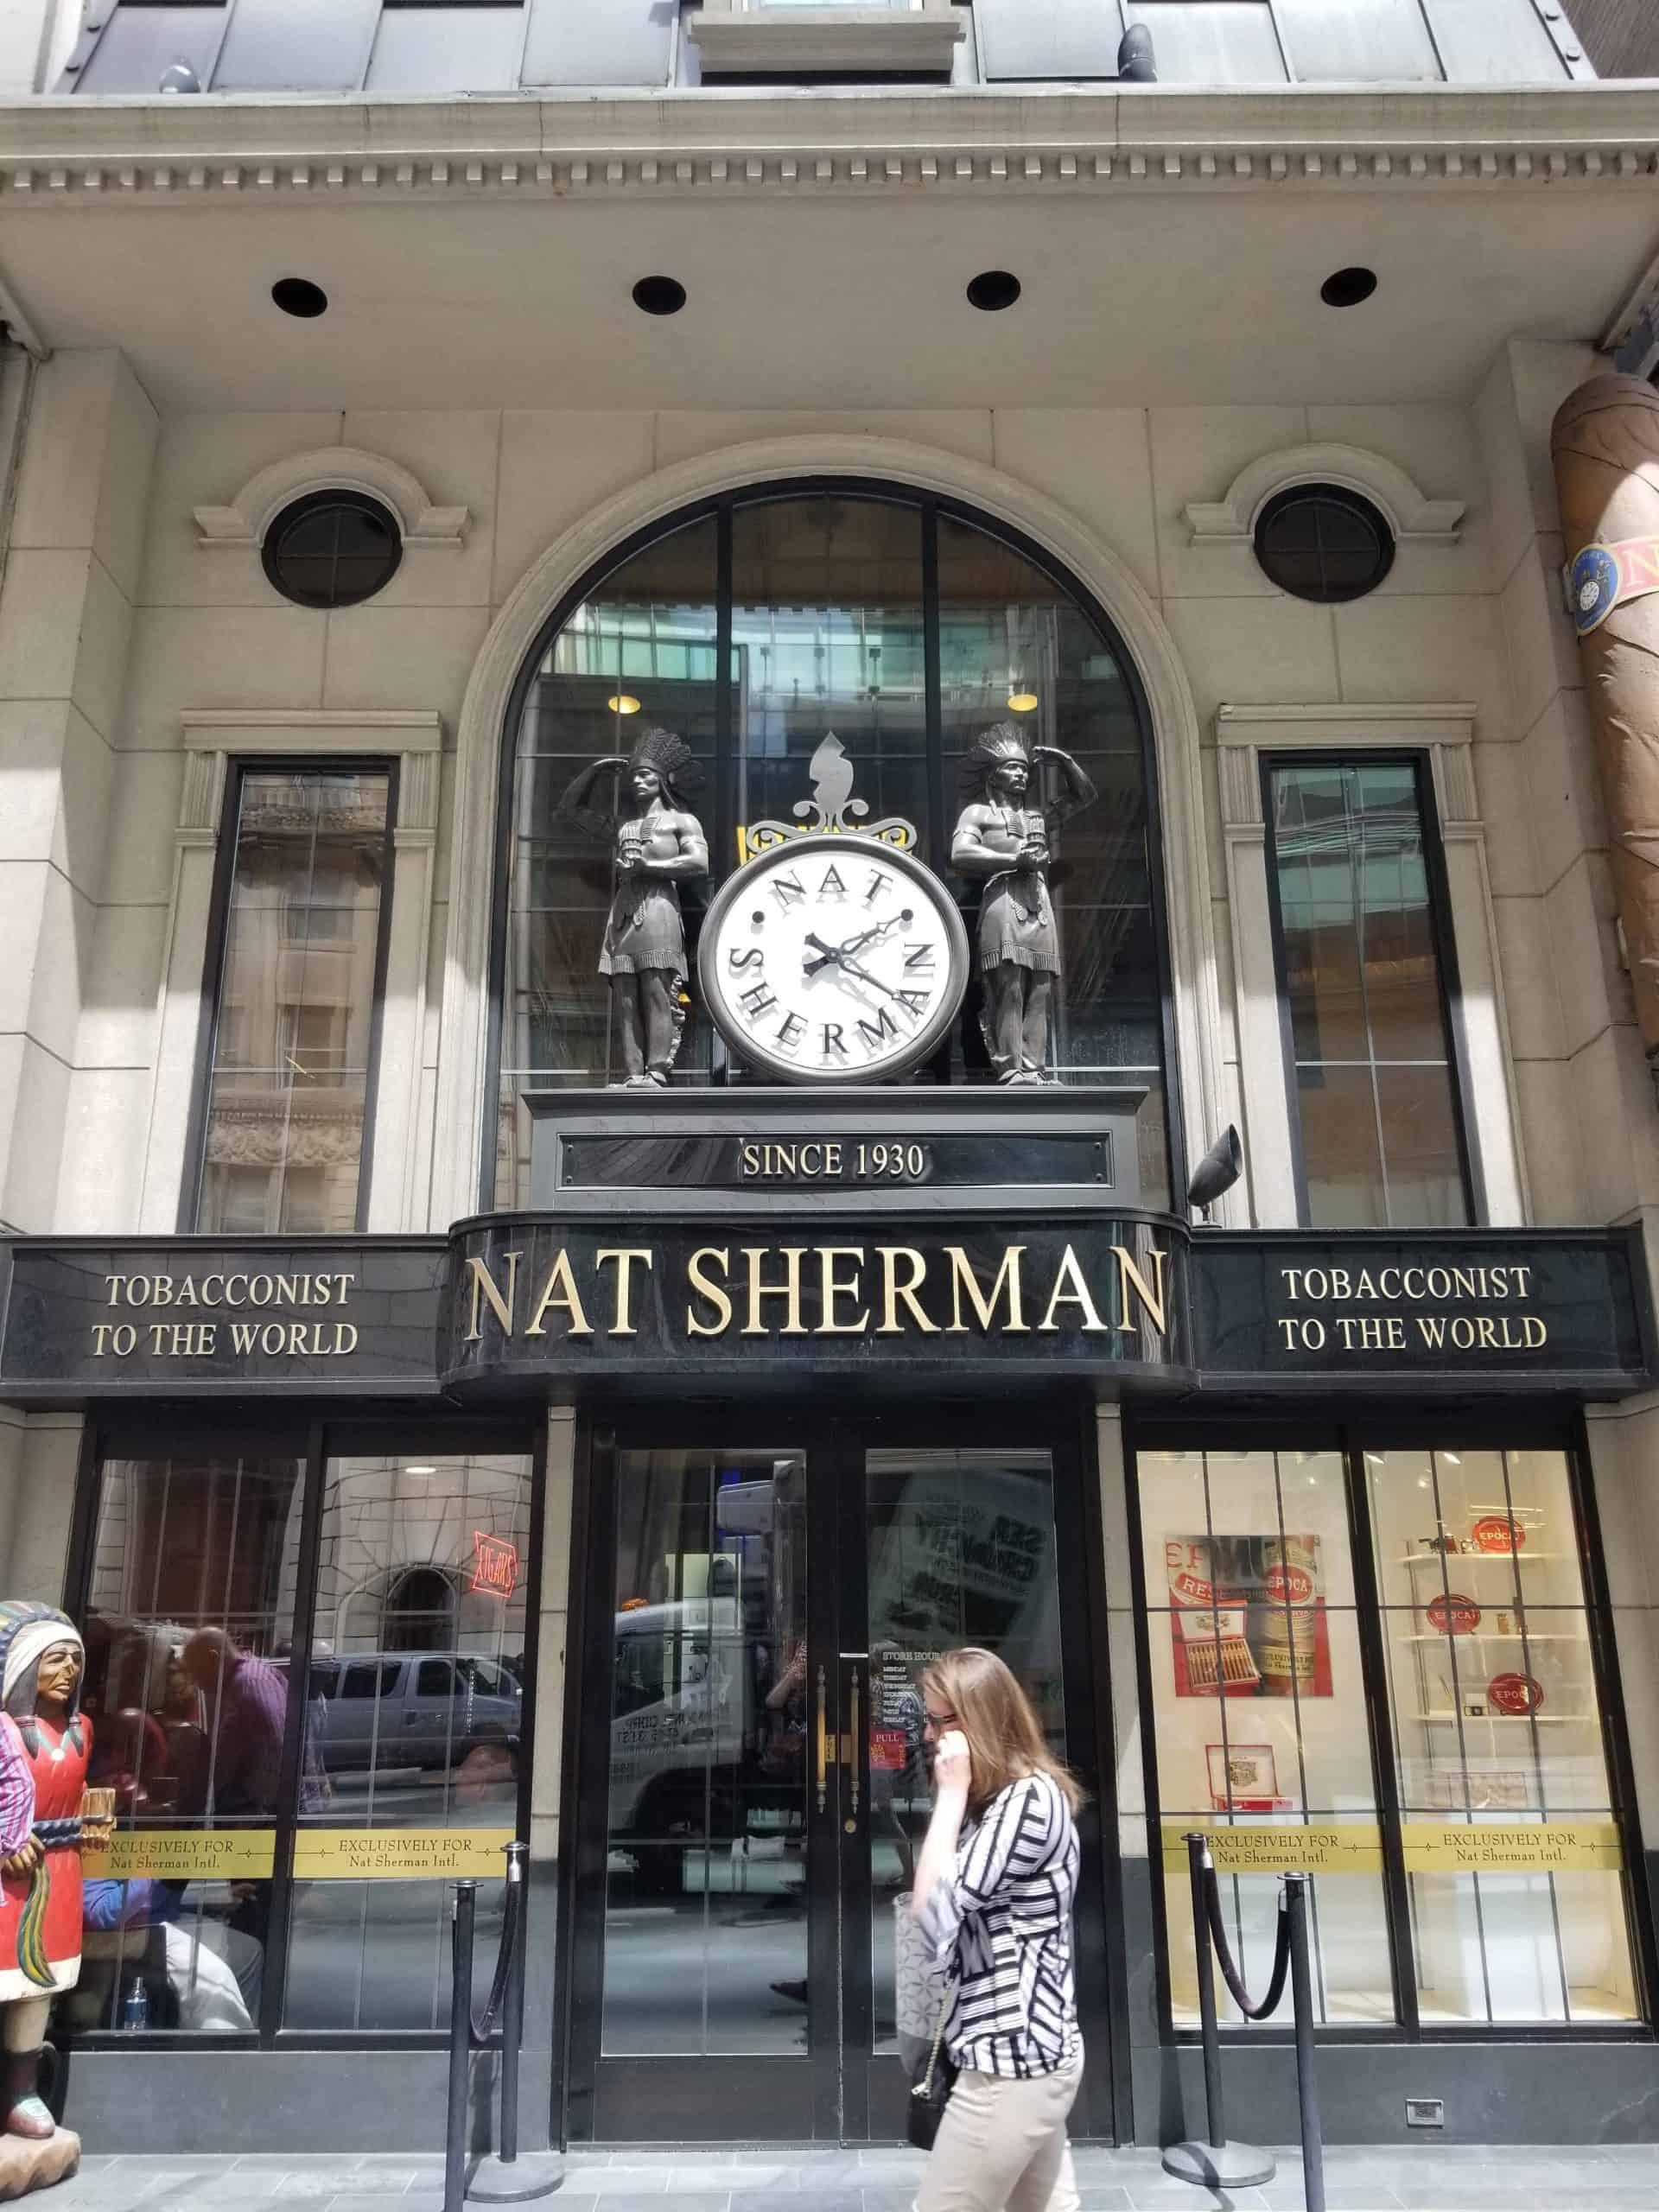 newyork42nd_Tour Point 14 Narration 1 Nat Sherman Townhouse